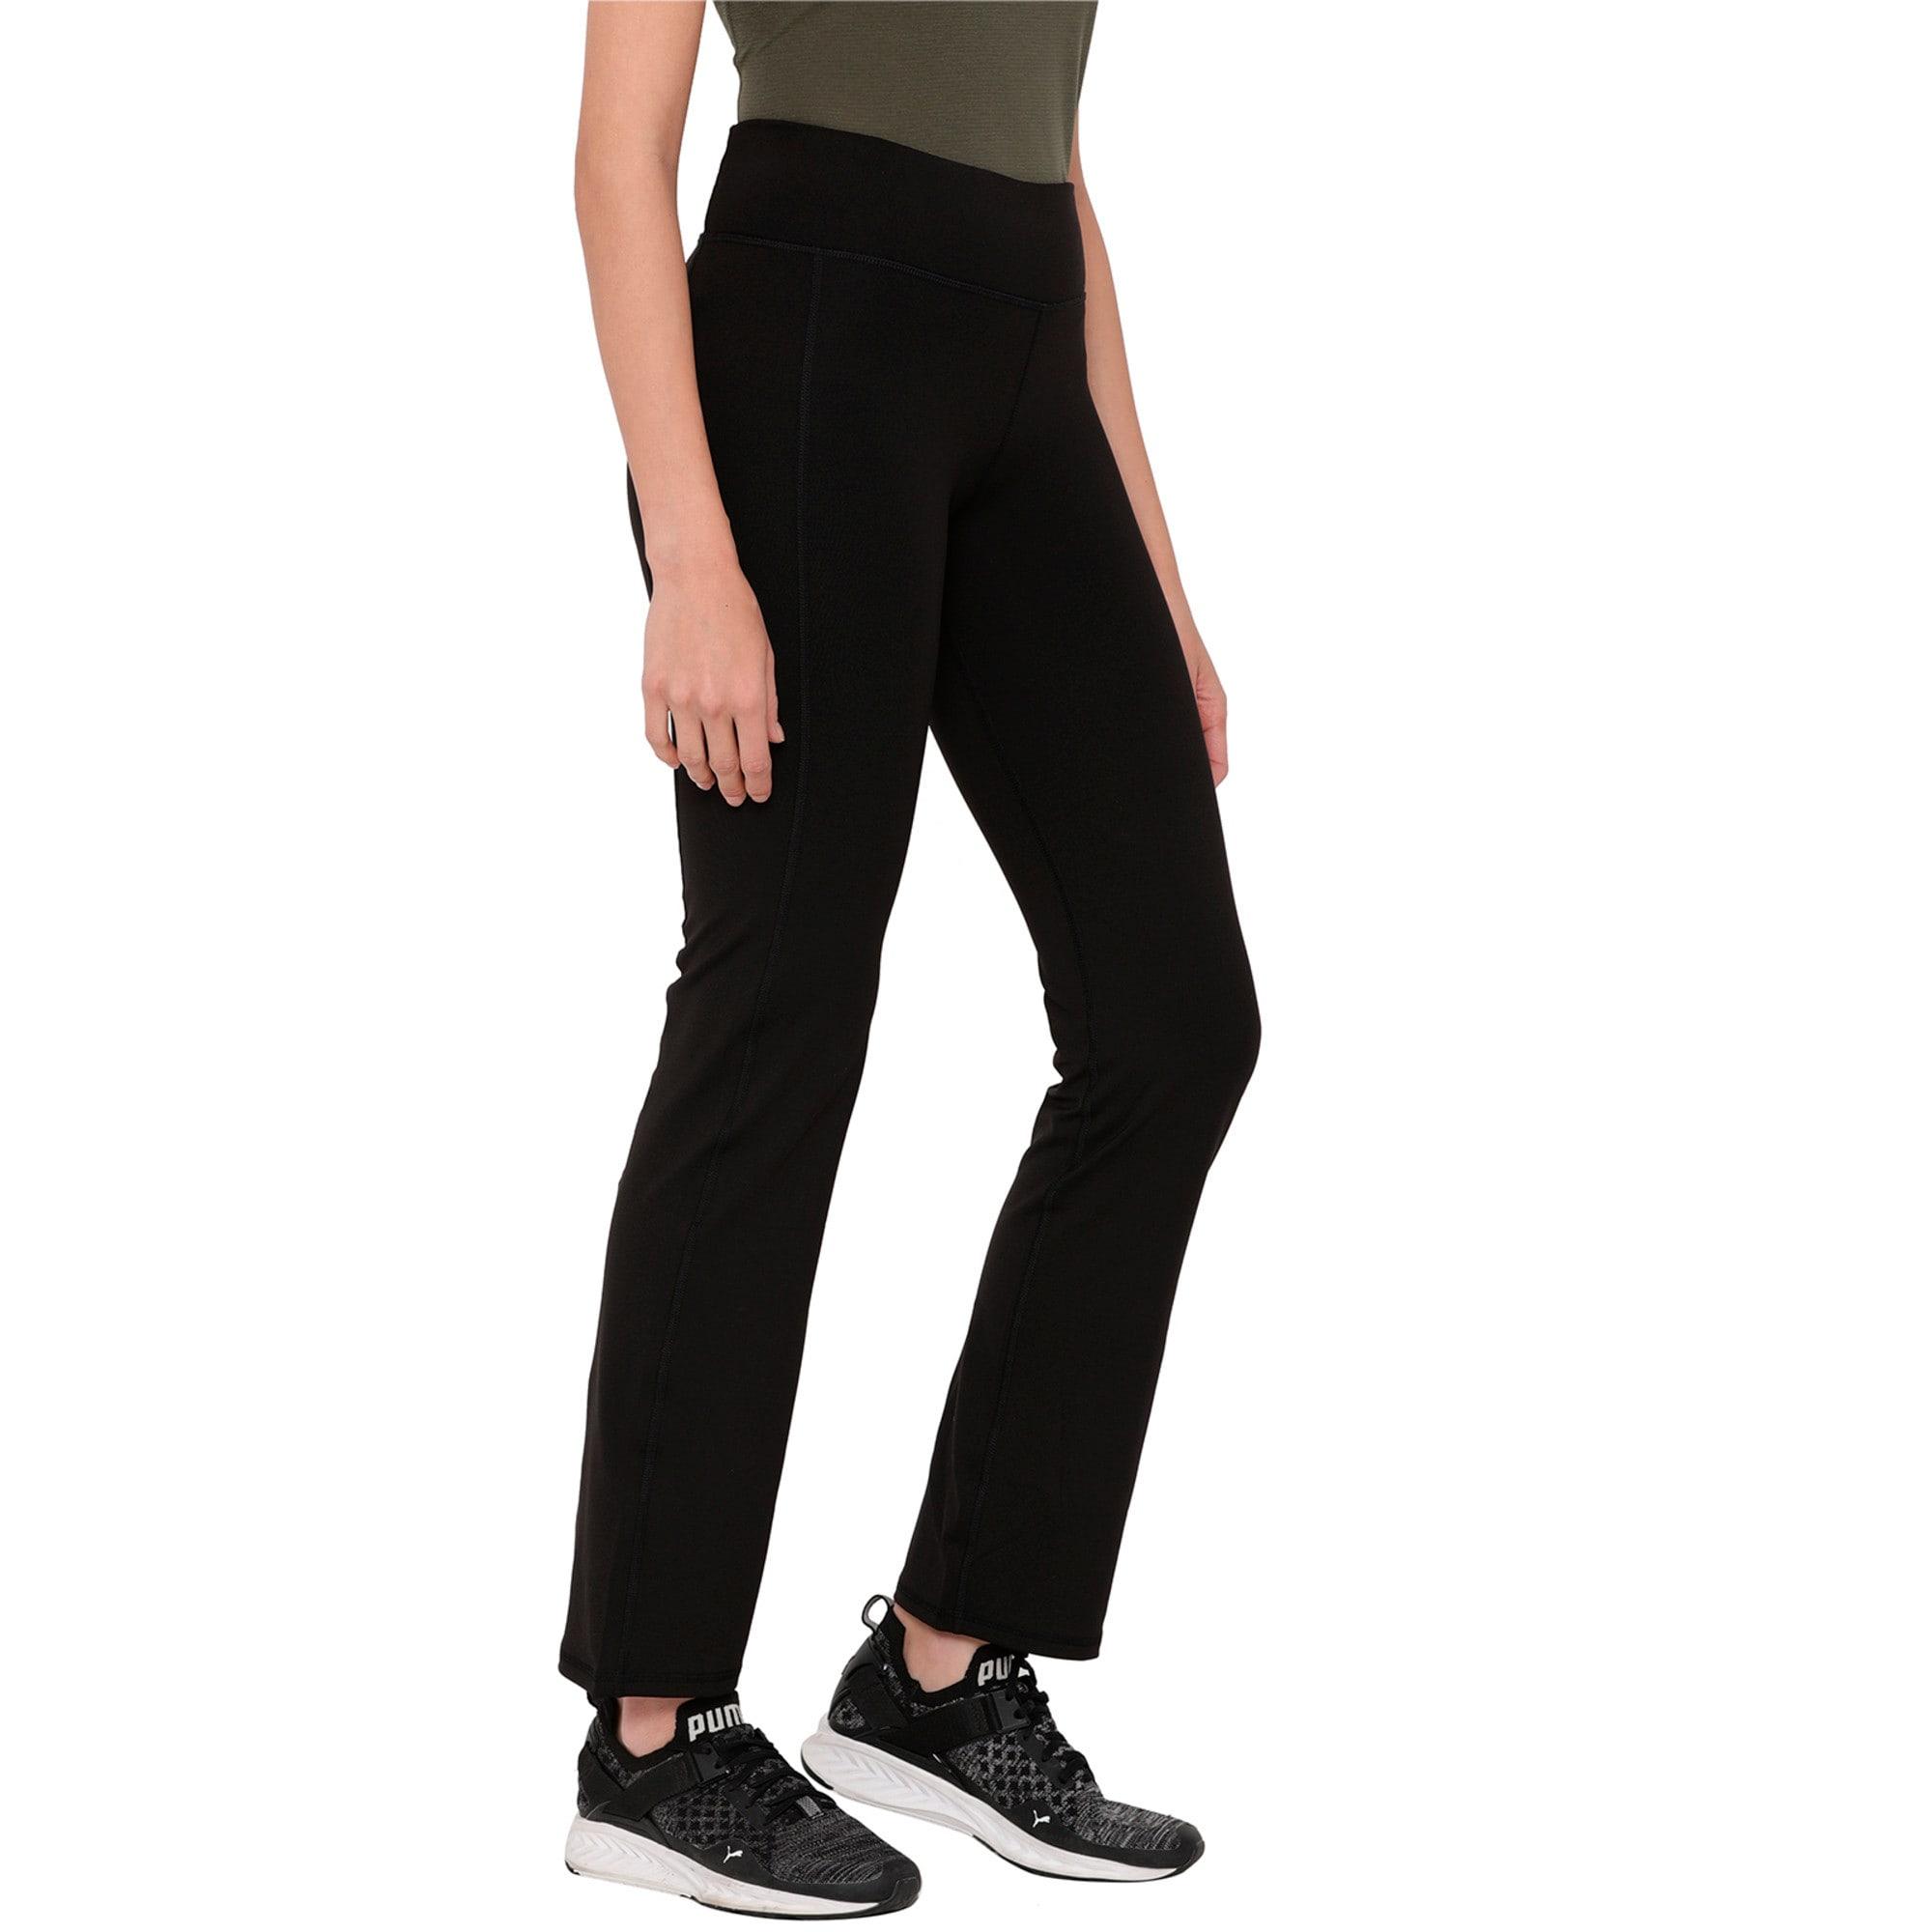 Thumbnail 1 of Essential Straight Leg, Puma Black, medium-IND